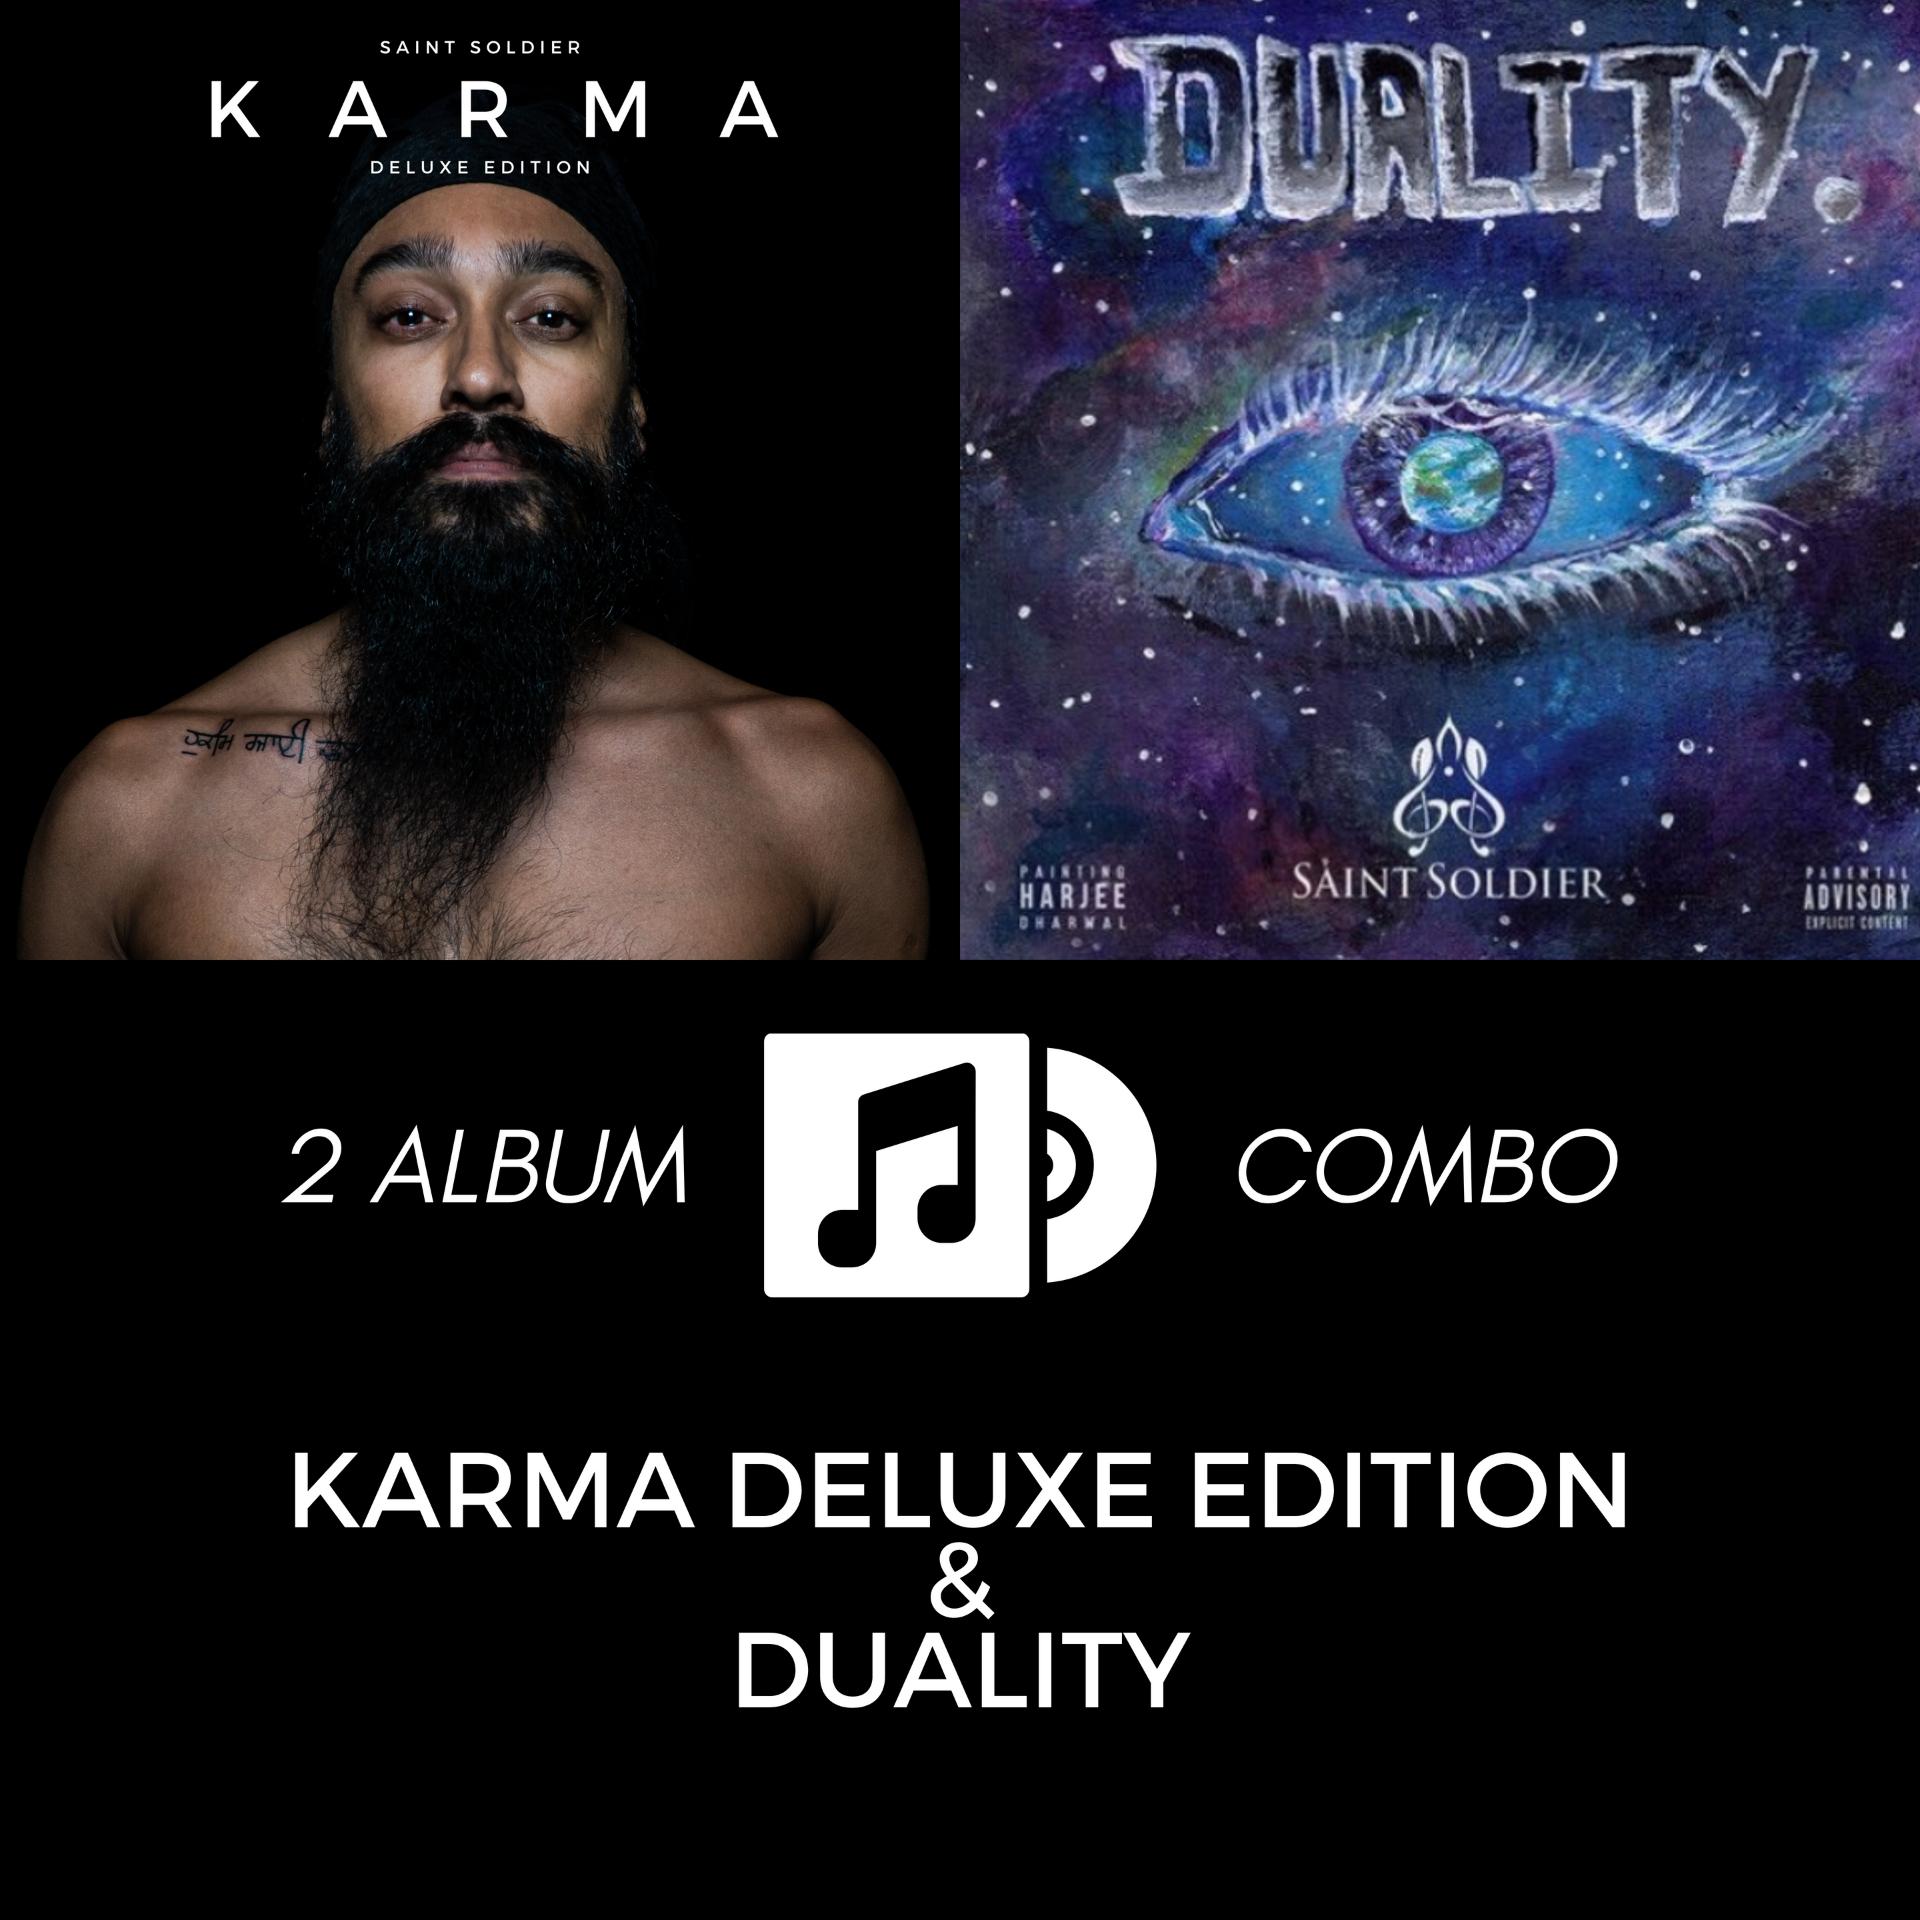 2 Album Combo